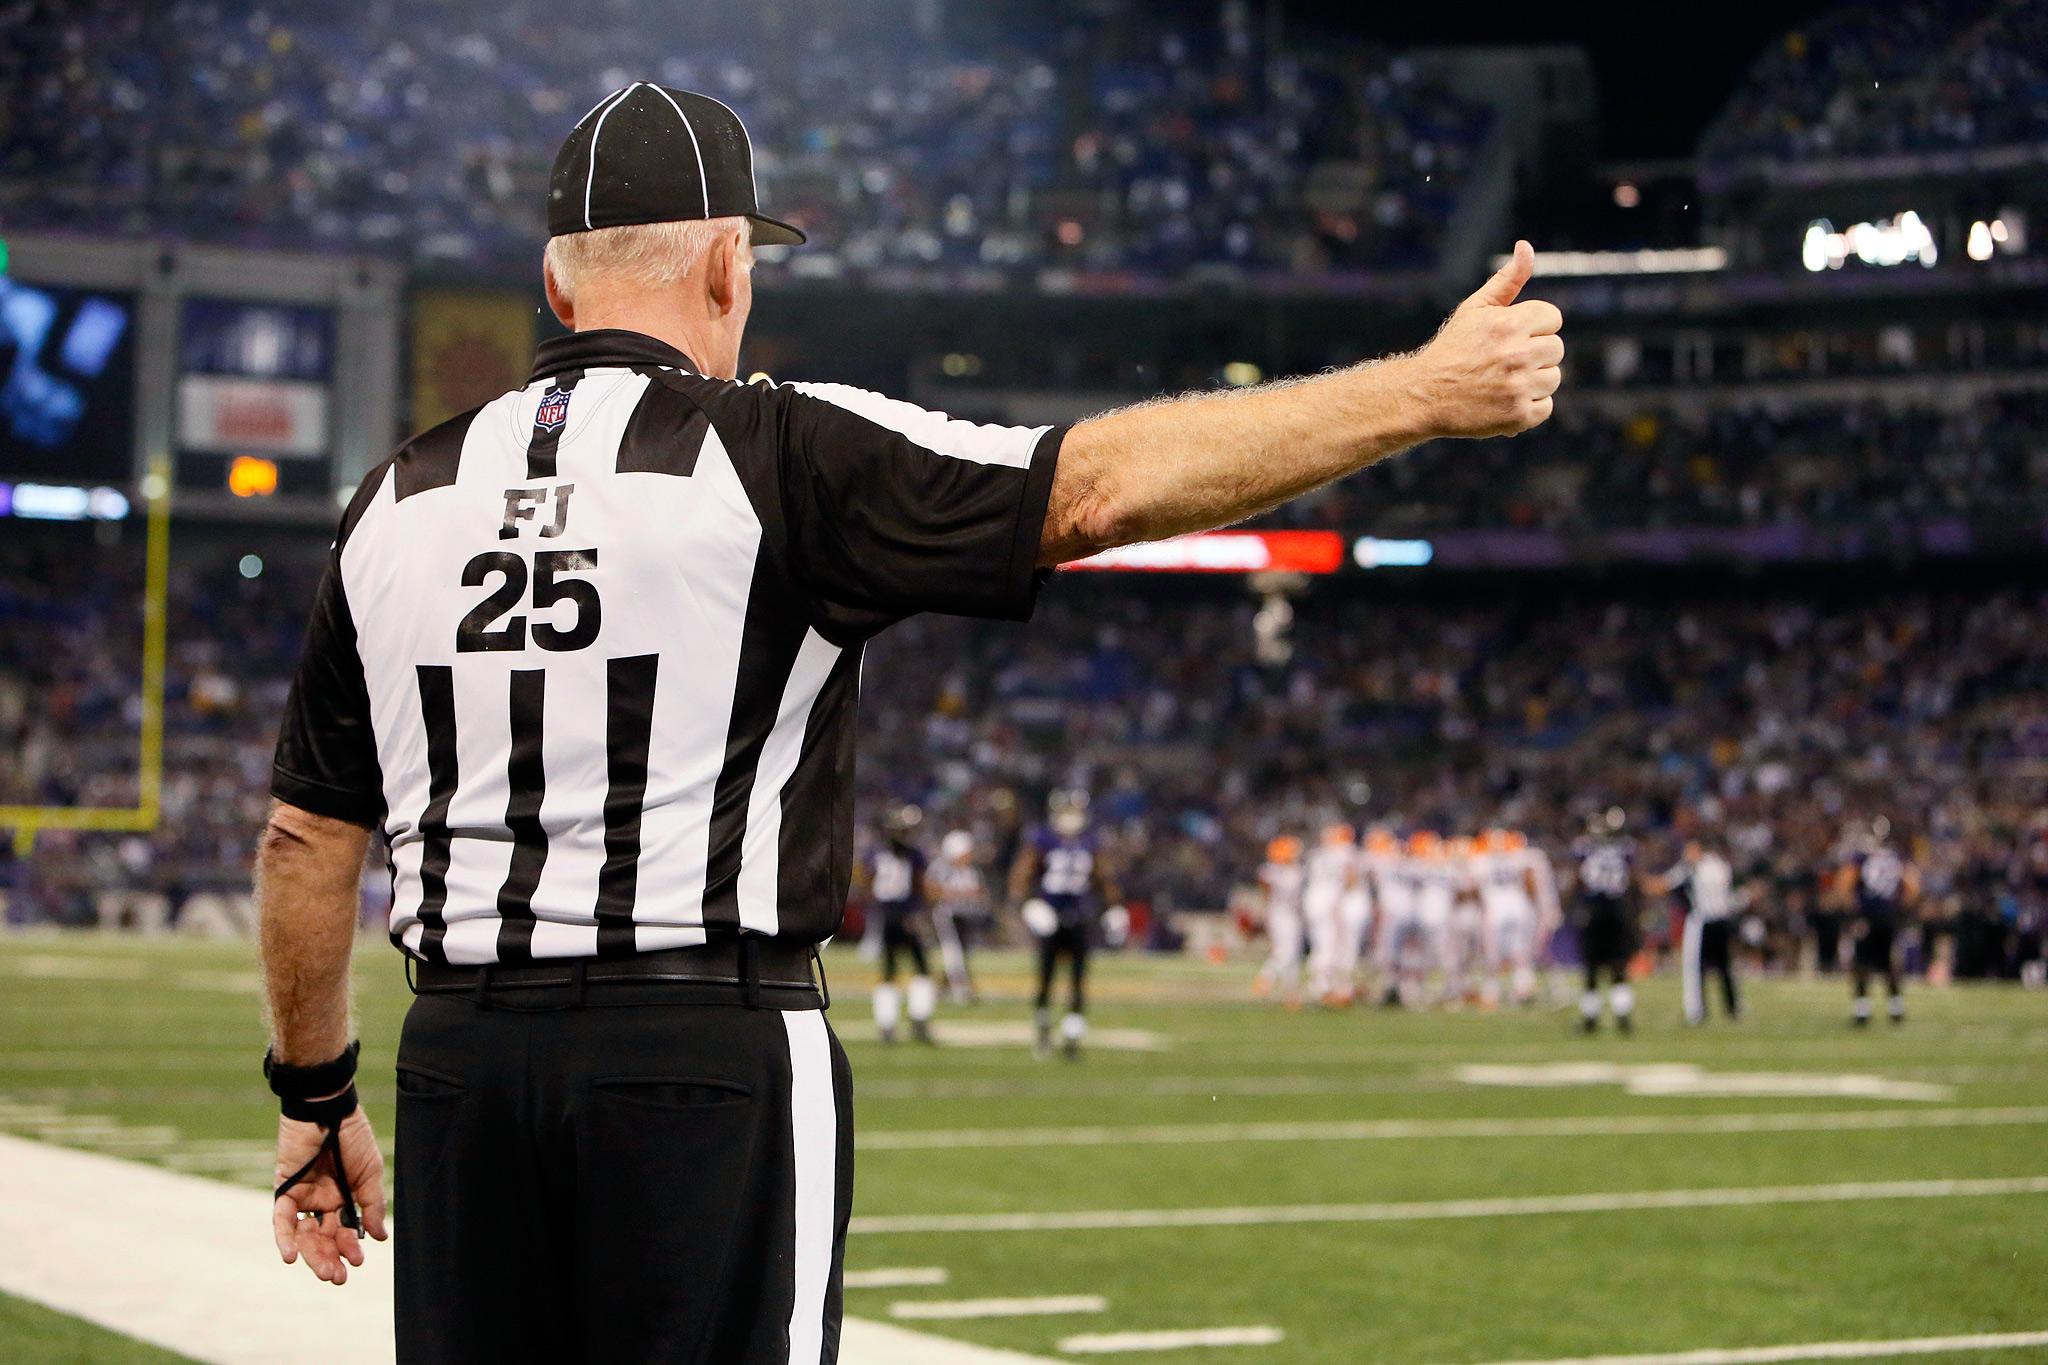 Referee Bob Waggoner